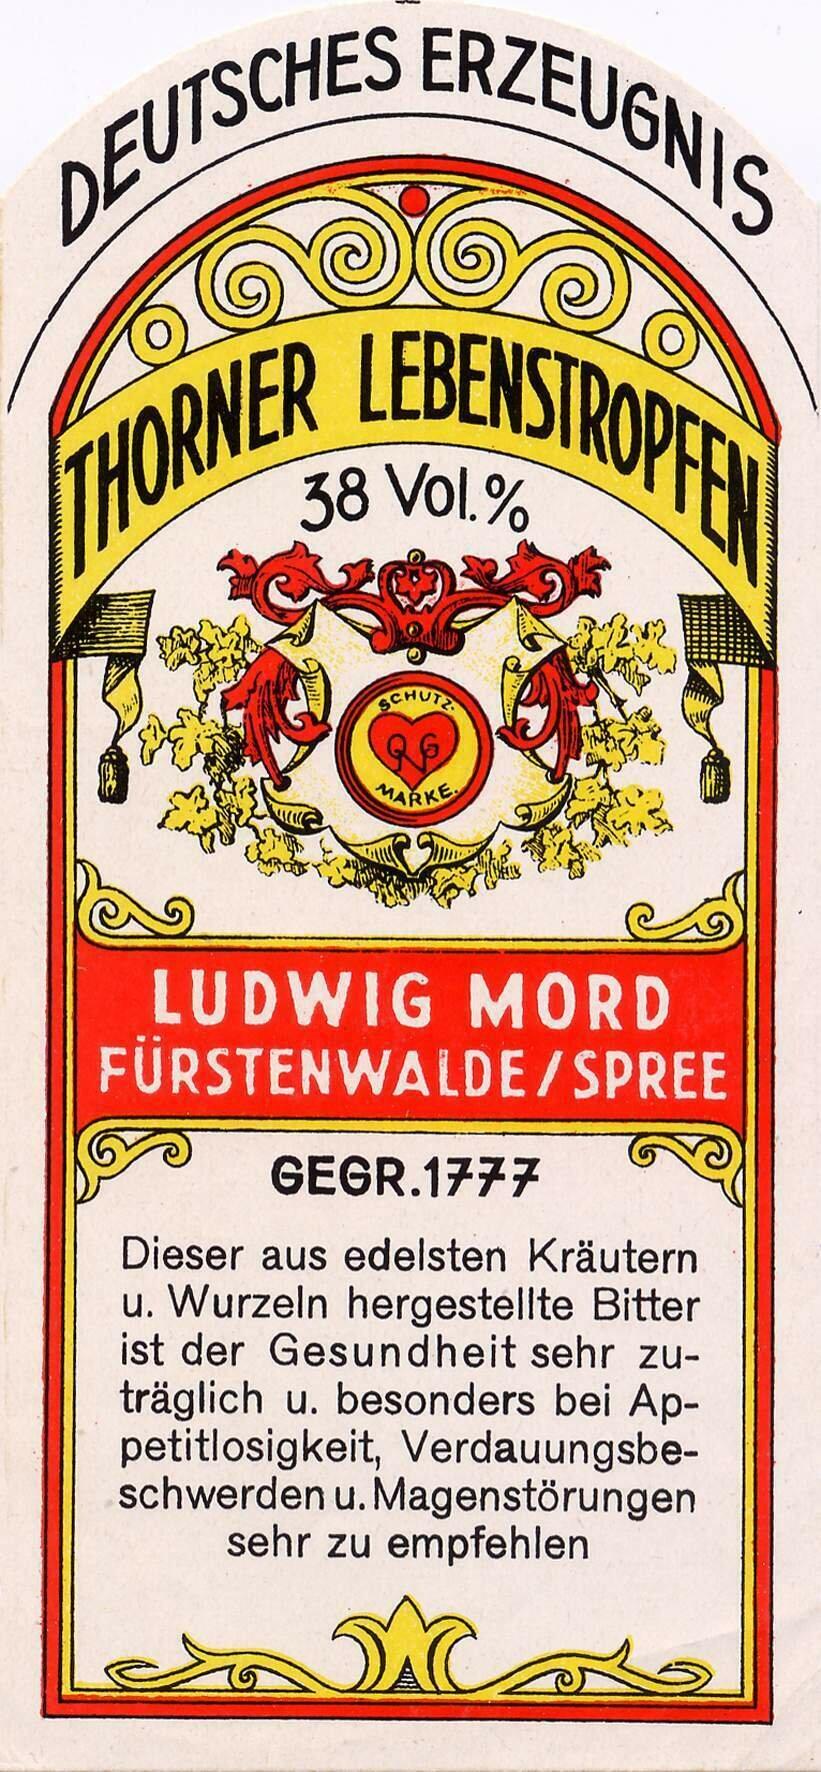 Etikett Thorner Lebenstropfen, Likörfarbik Ludwig Mord, ©Stephan Becker, Brüssow